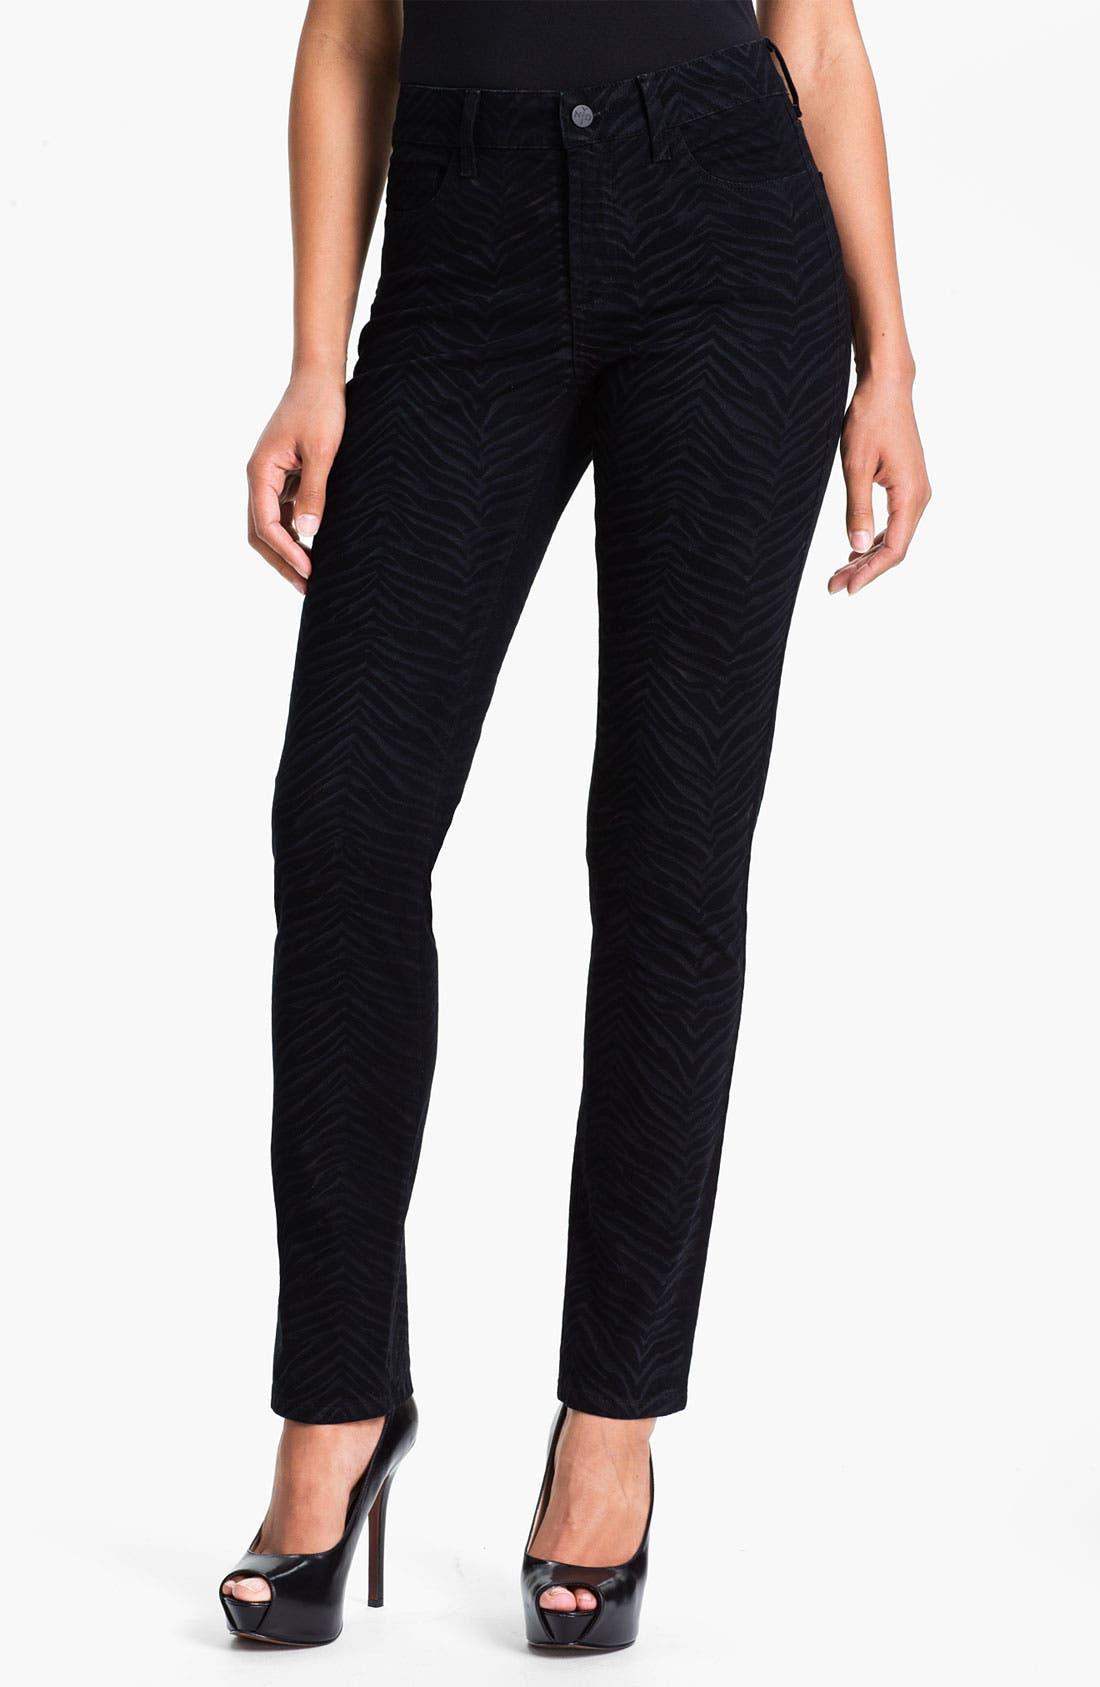 Main Image - NYDJ 'Sheri - Zebra' Print Twill Skinny Jeans (Petite)